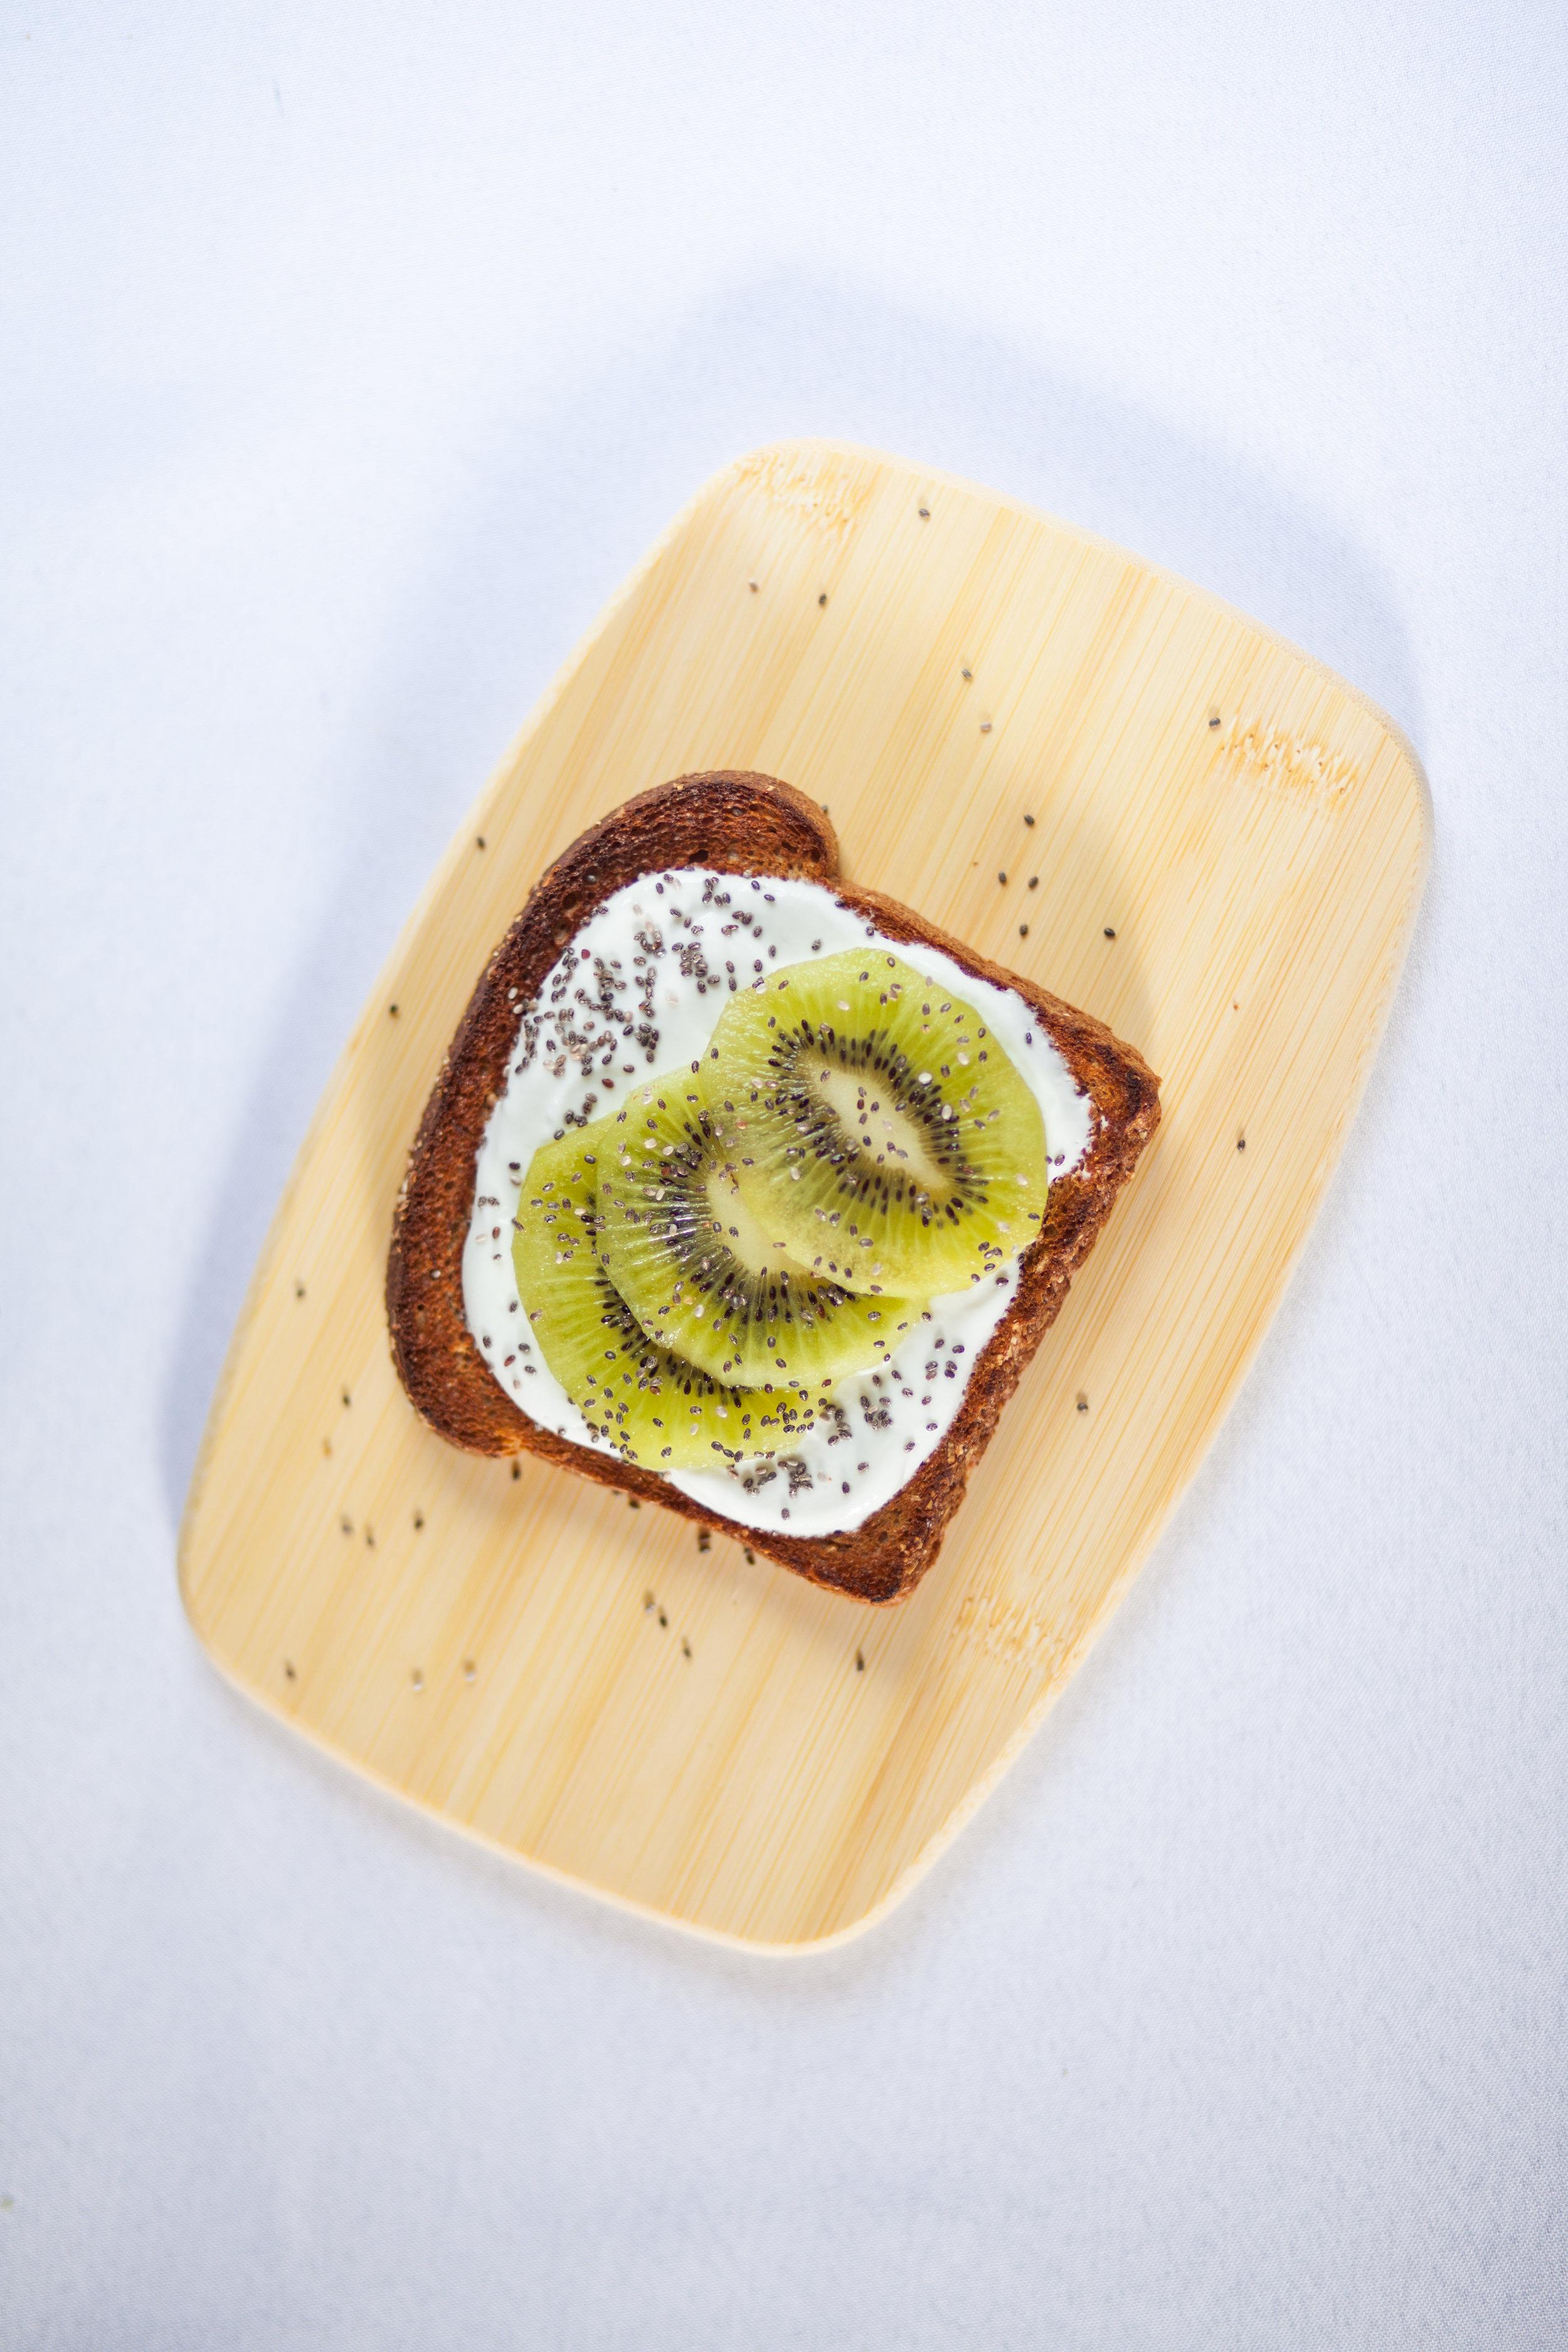 Toast topped with greek yogurt and kiwi